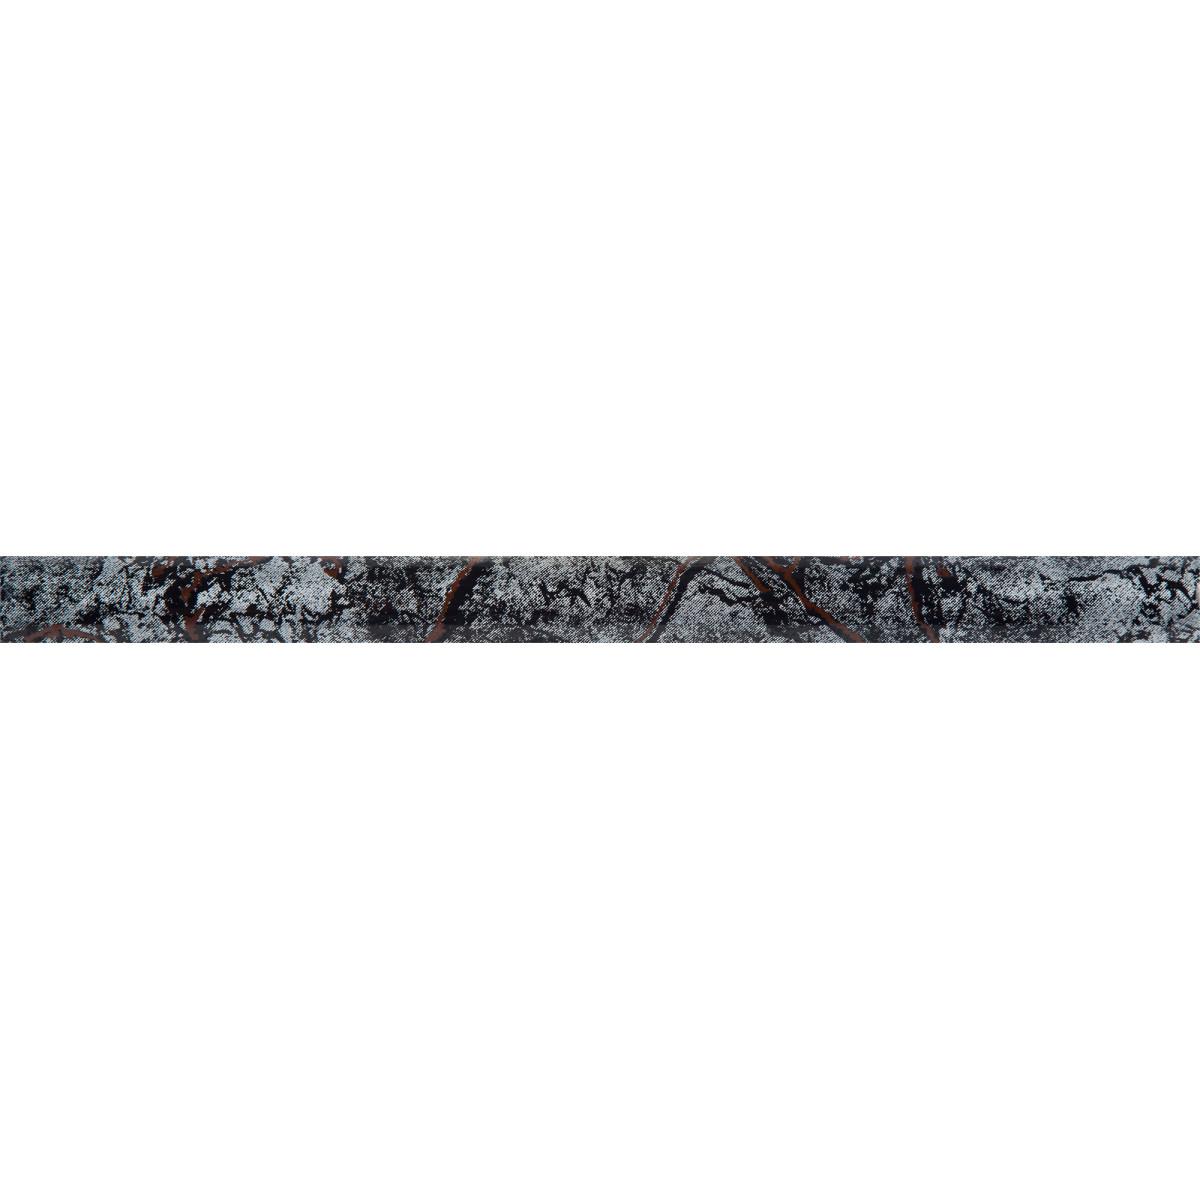 Карандаш «Цезарь» 25х2 см